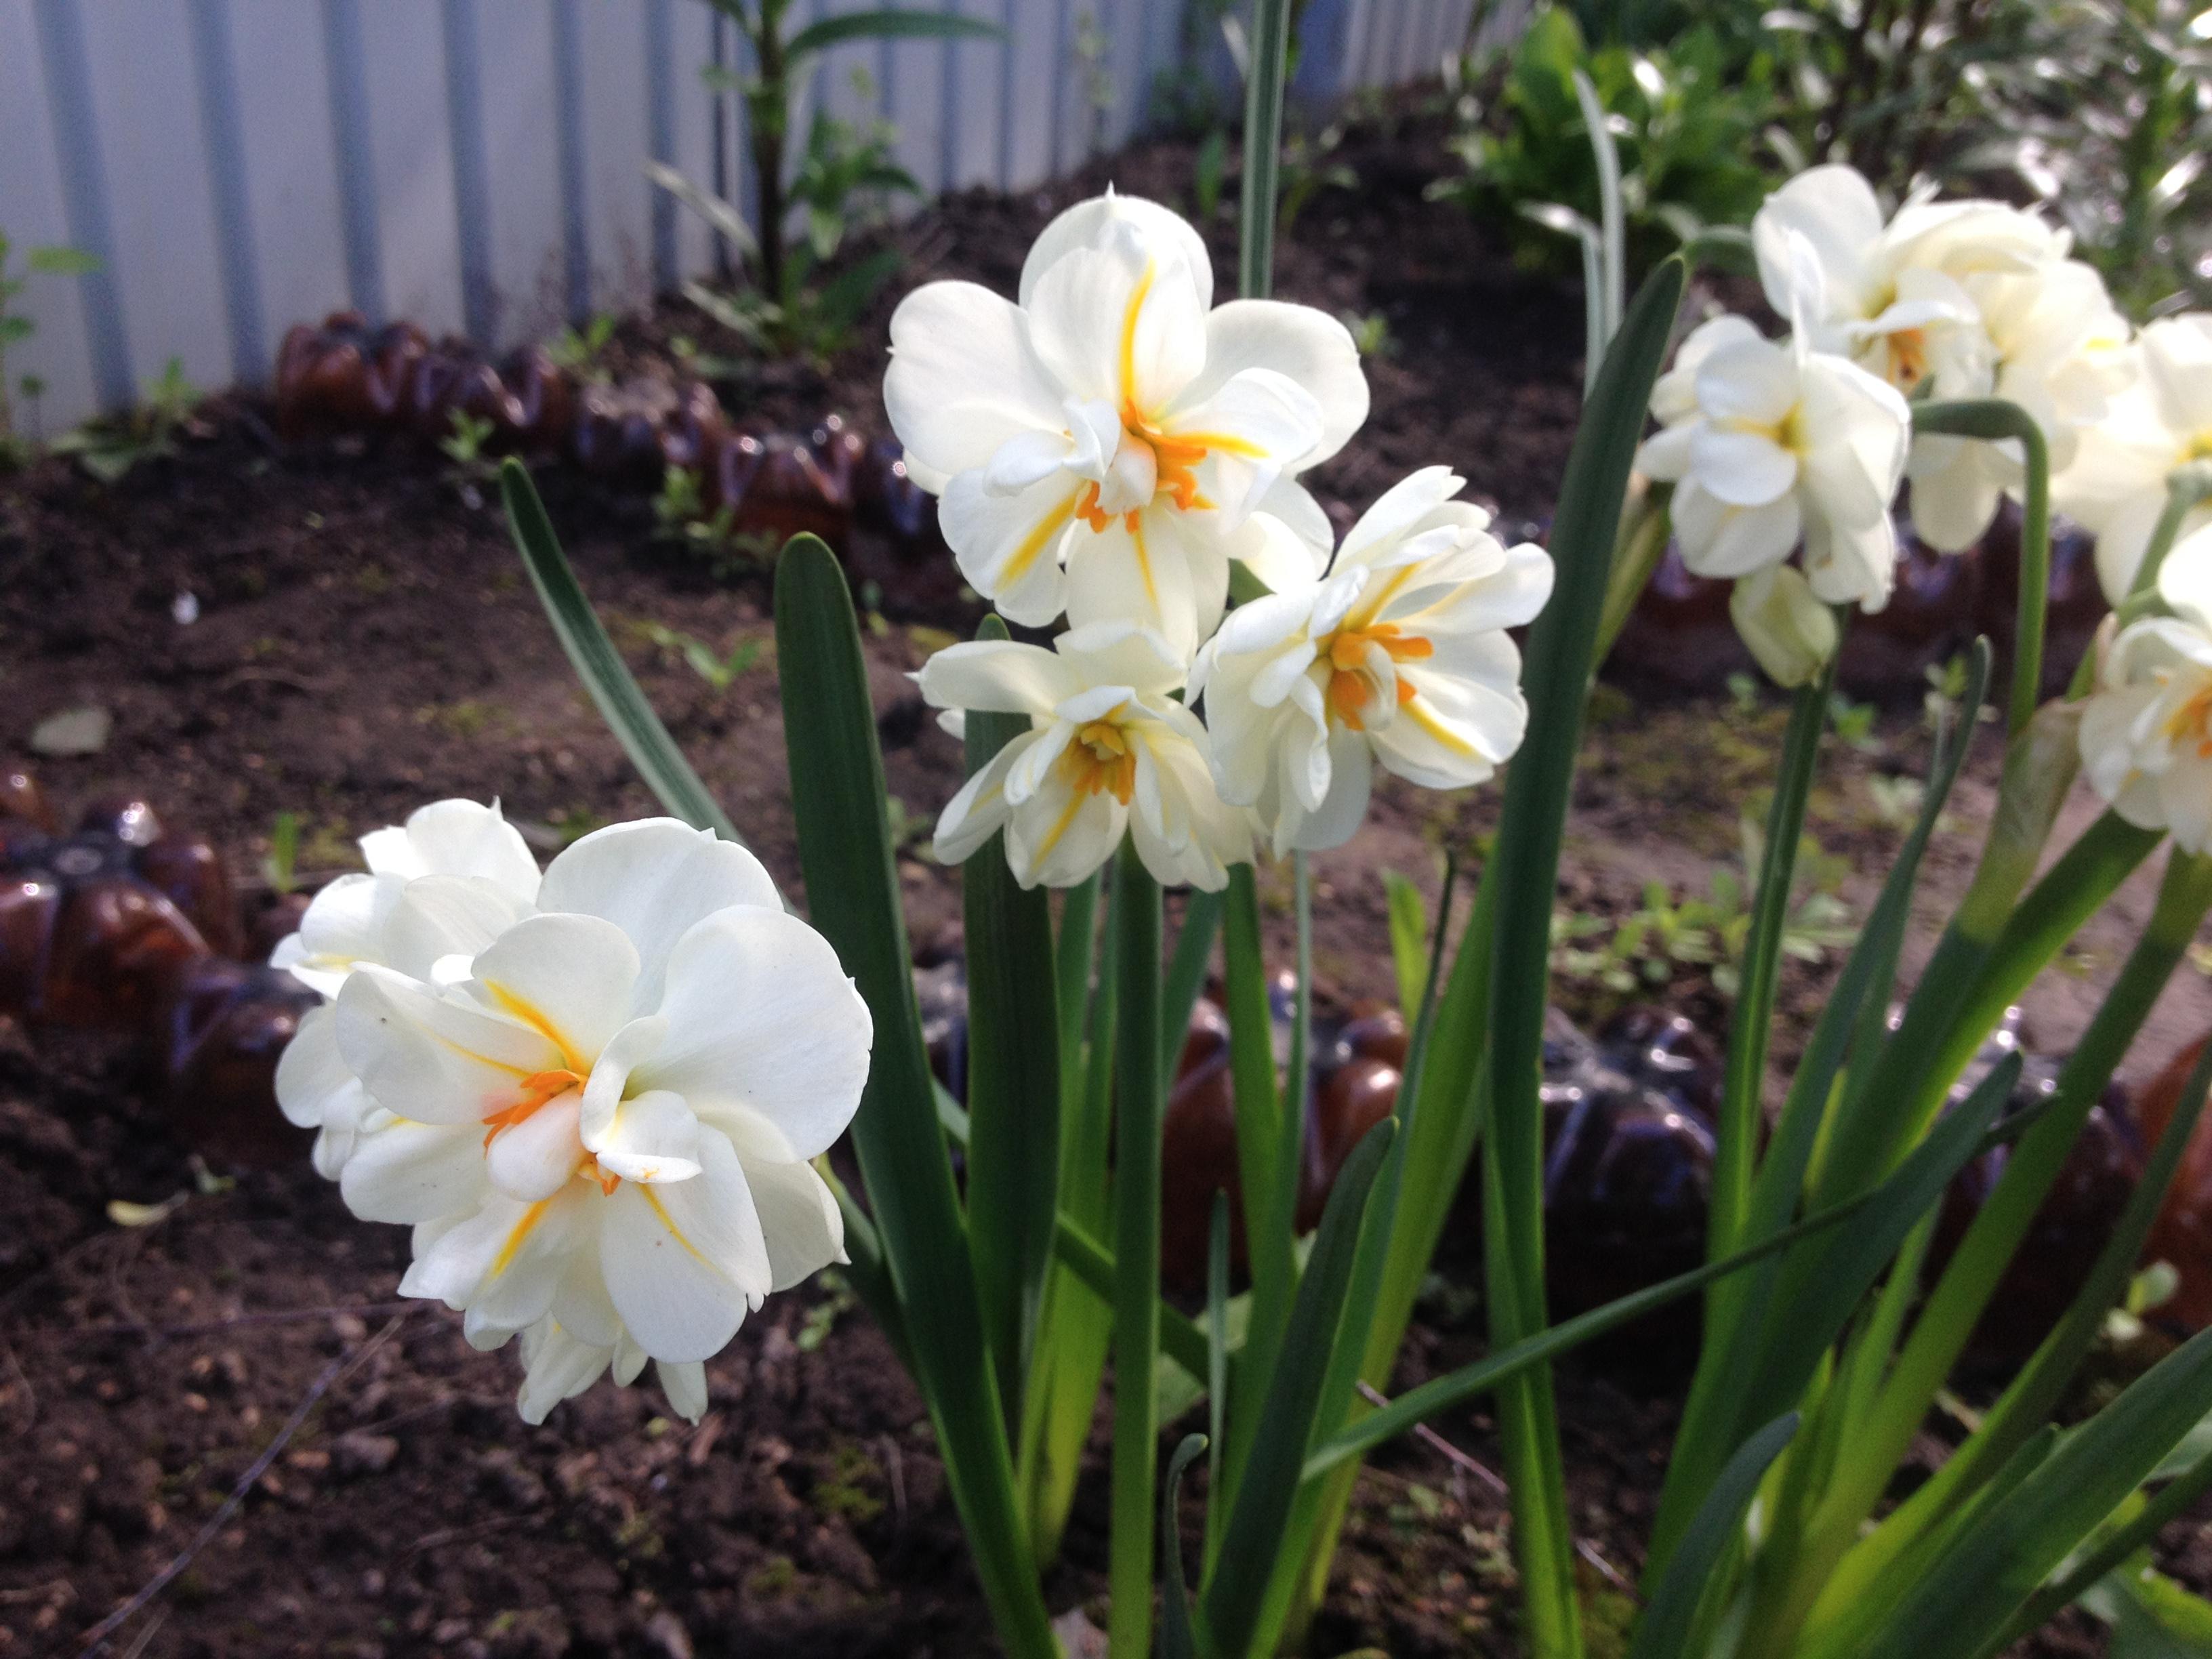 Нарцисс: сорта, фото, посадка, уход, выращивание и обрезка